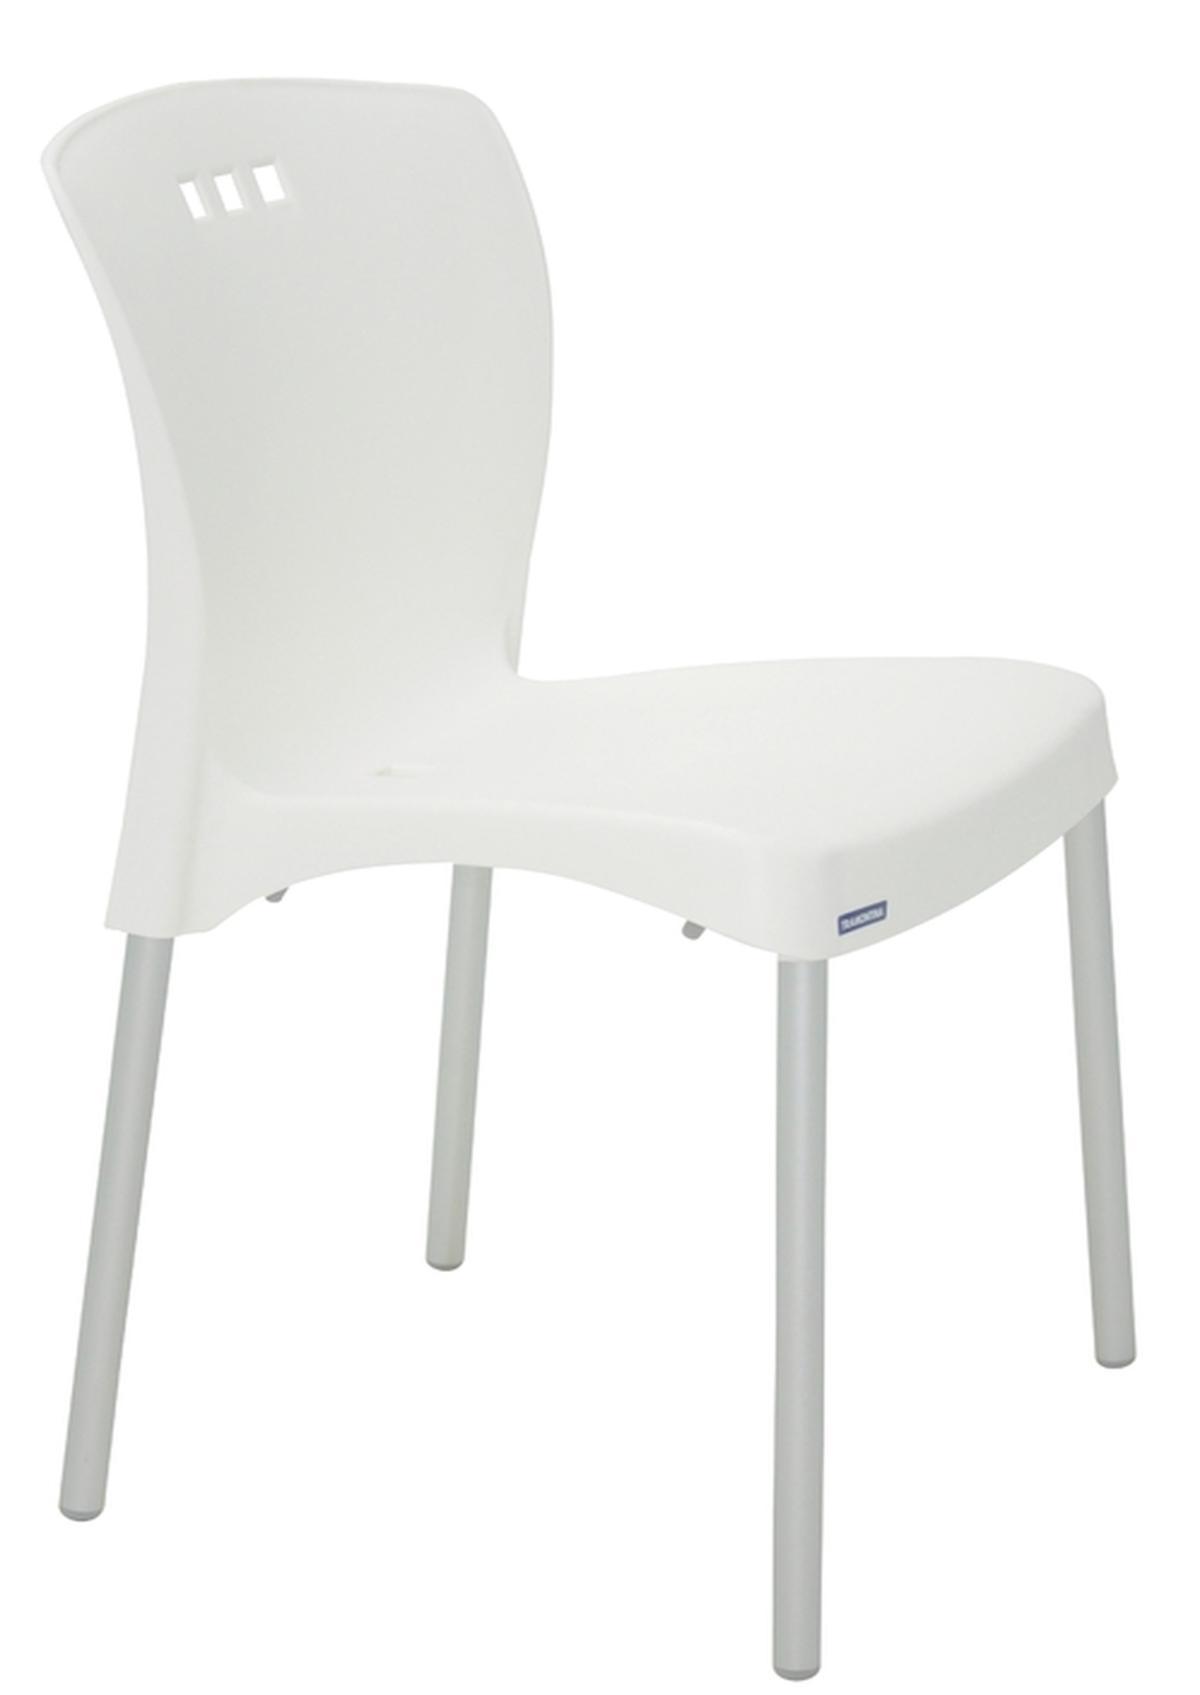 Cadeira Mona Branca Pernas Anodizadas